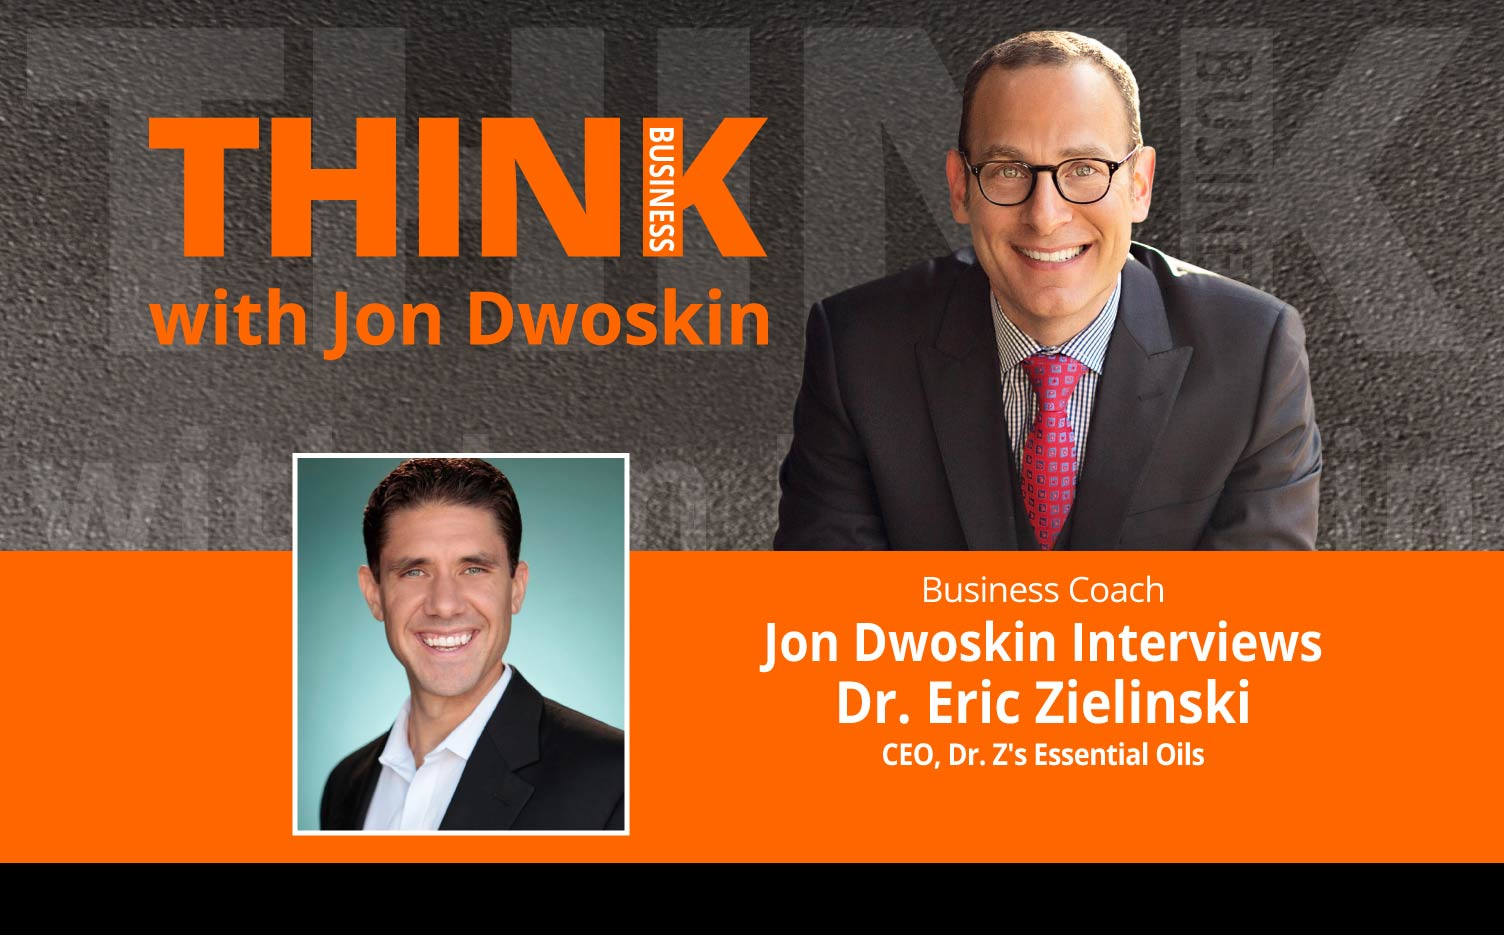 THINK Business Podcast: Jon Dwoskin Interviews Dr. Eric Zielinski, CEO, Dr. Z's Essential Oils